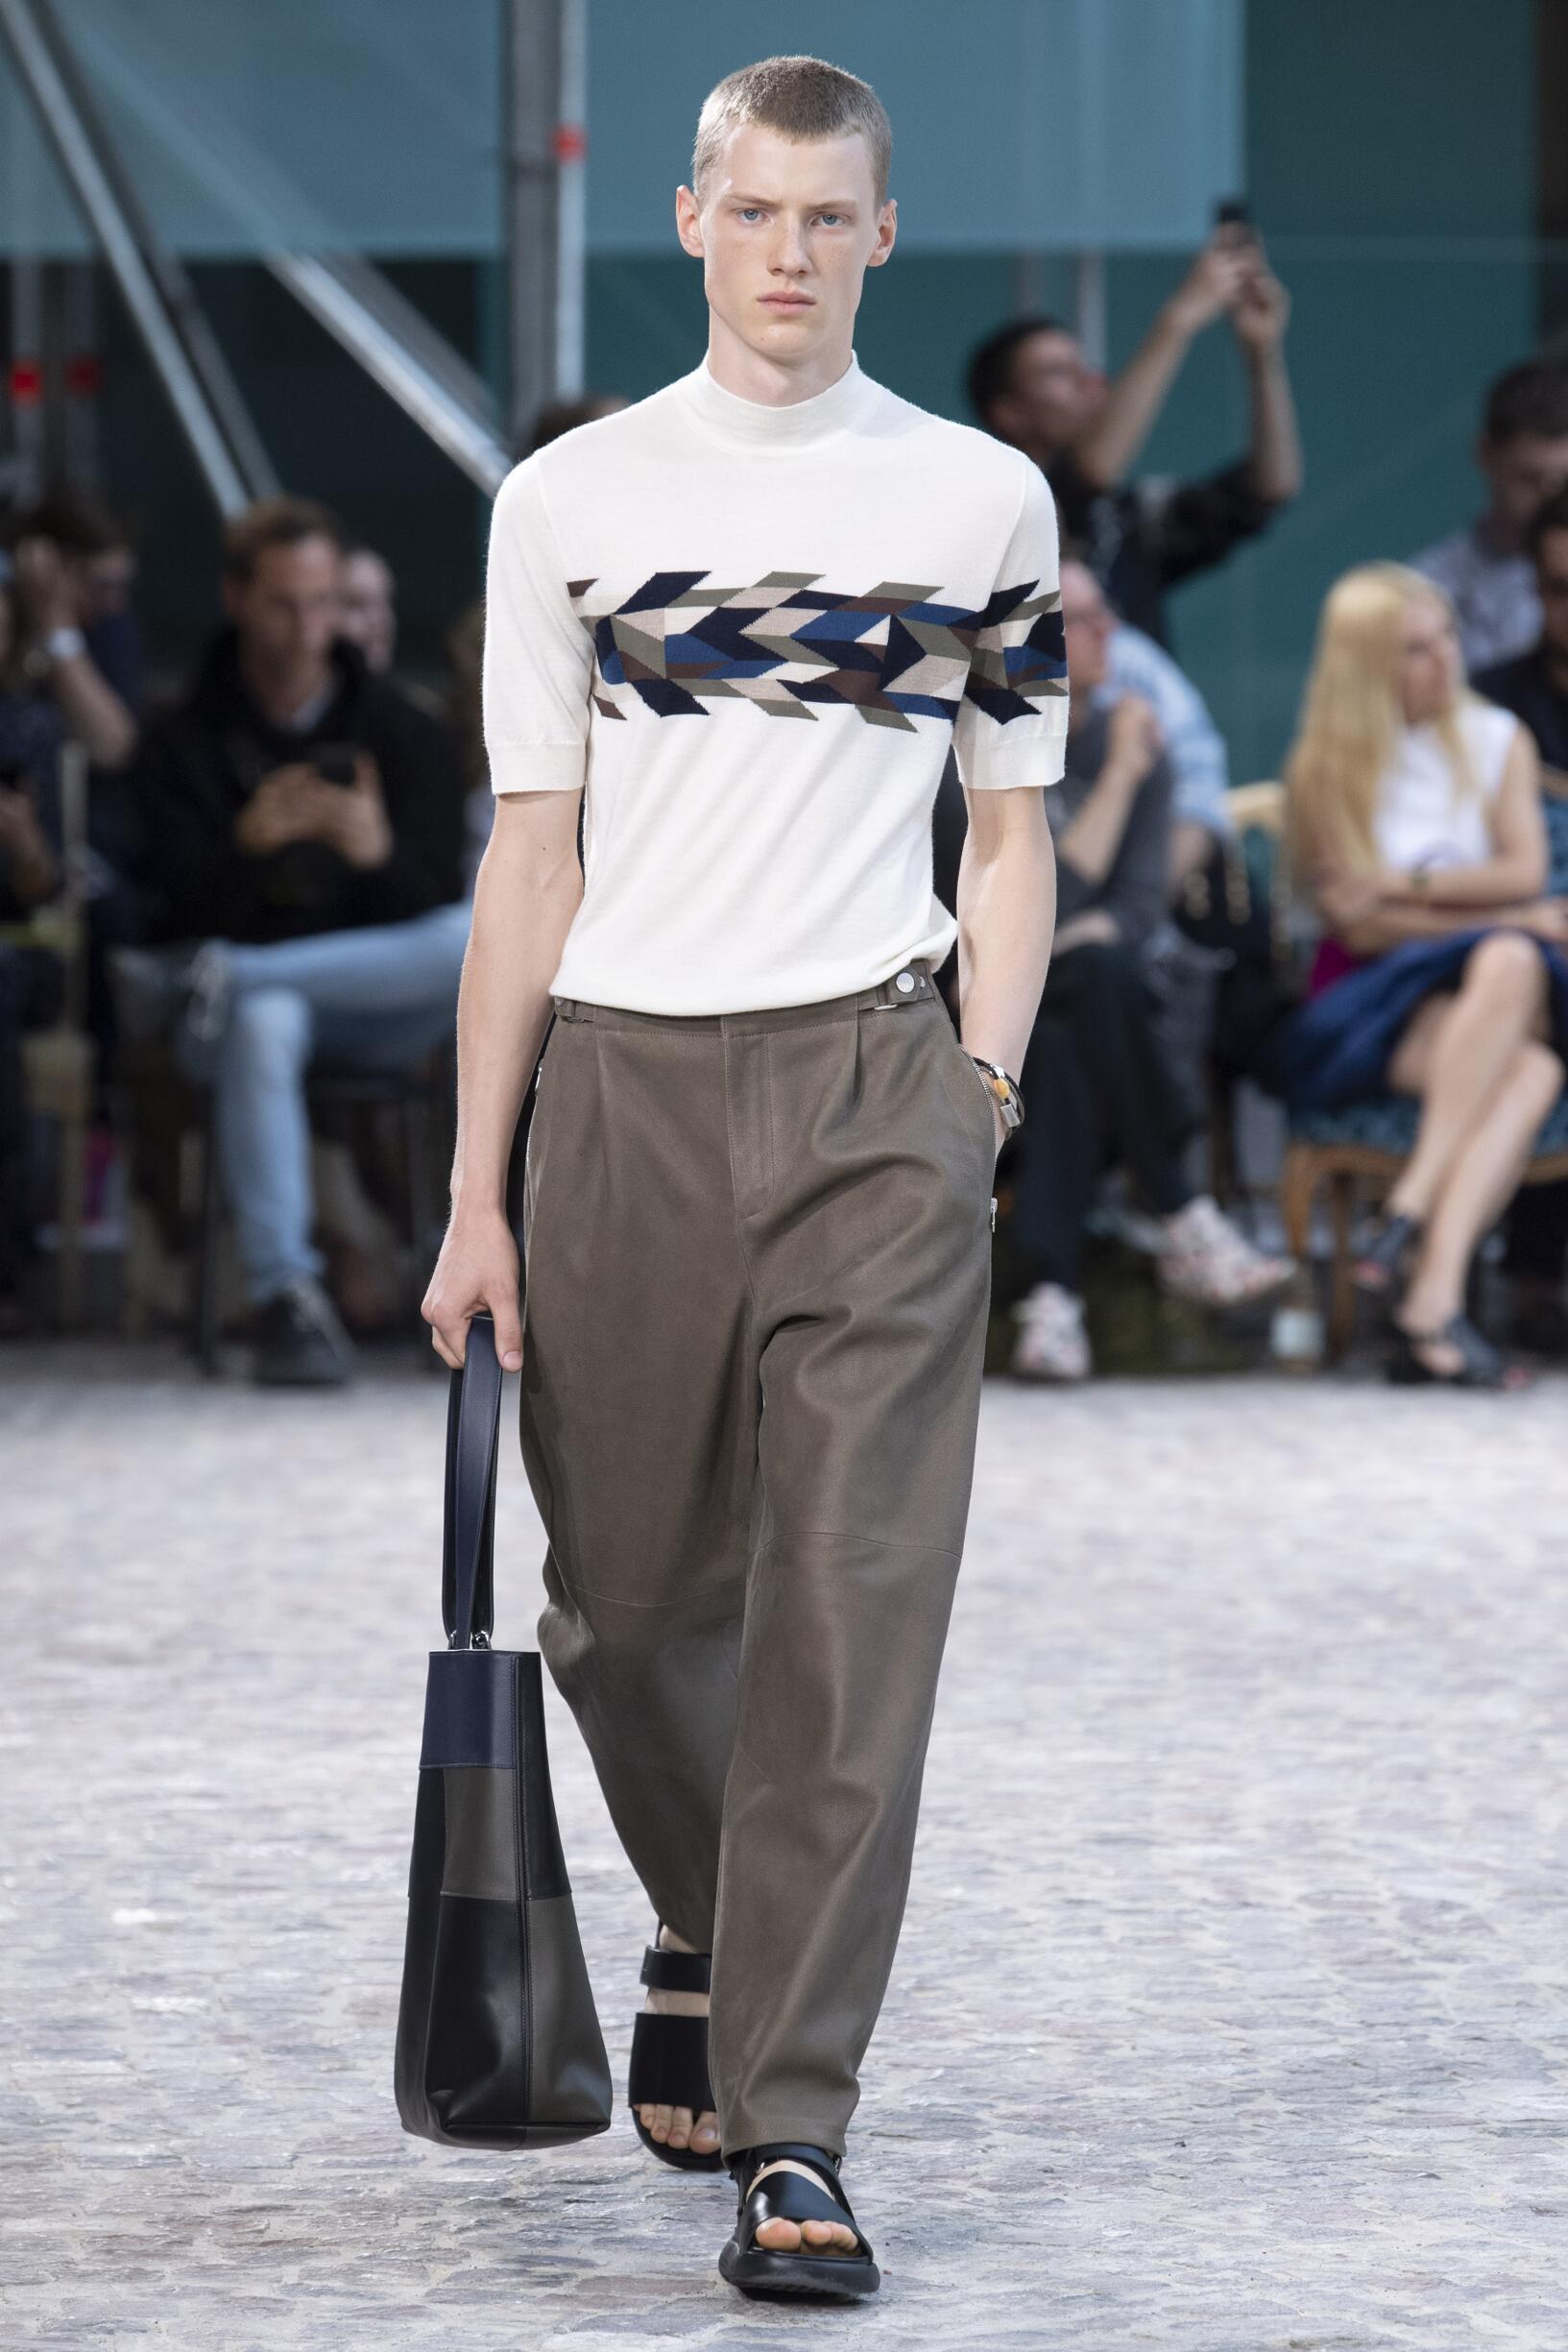 Hermès SS 2020 Menswear